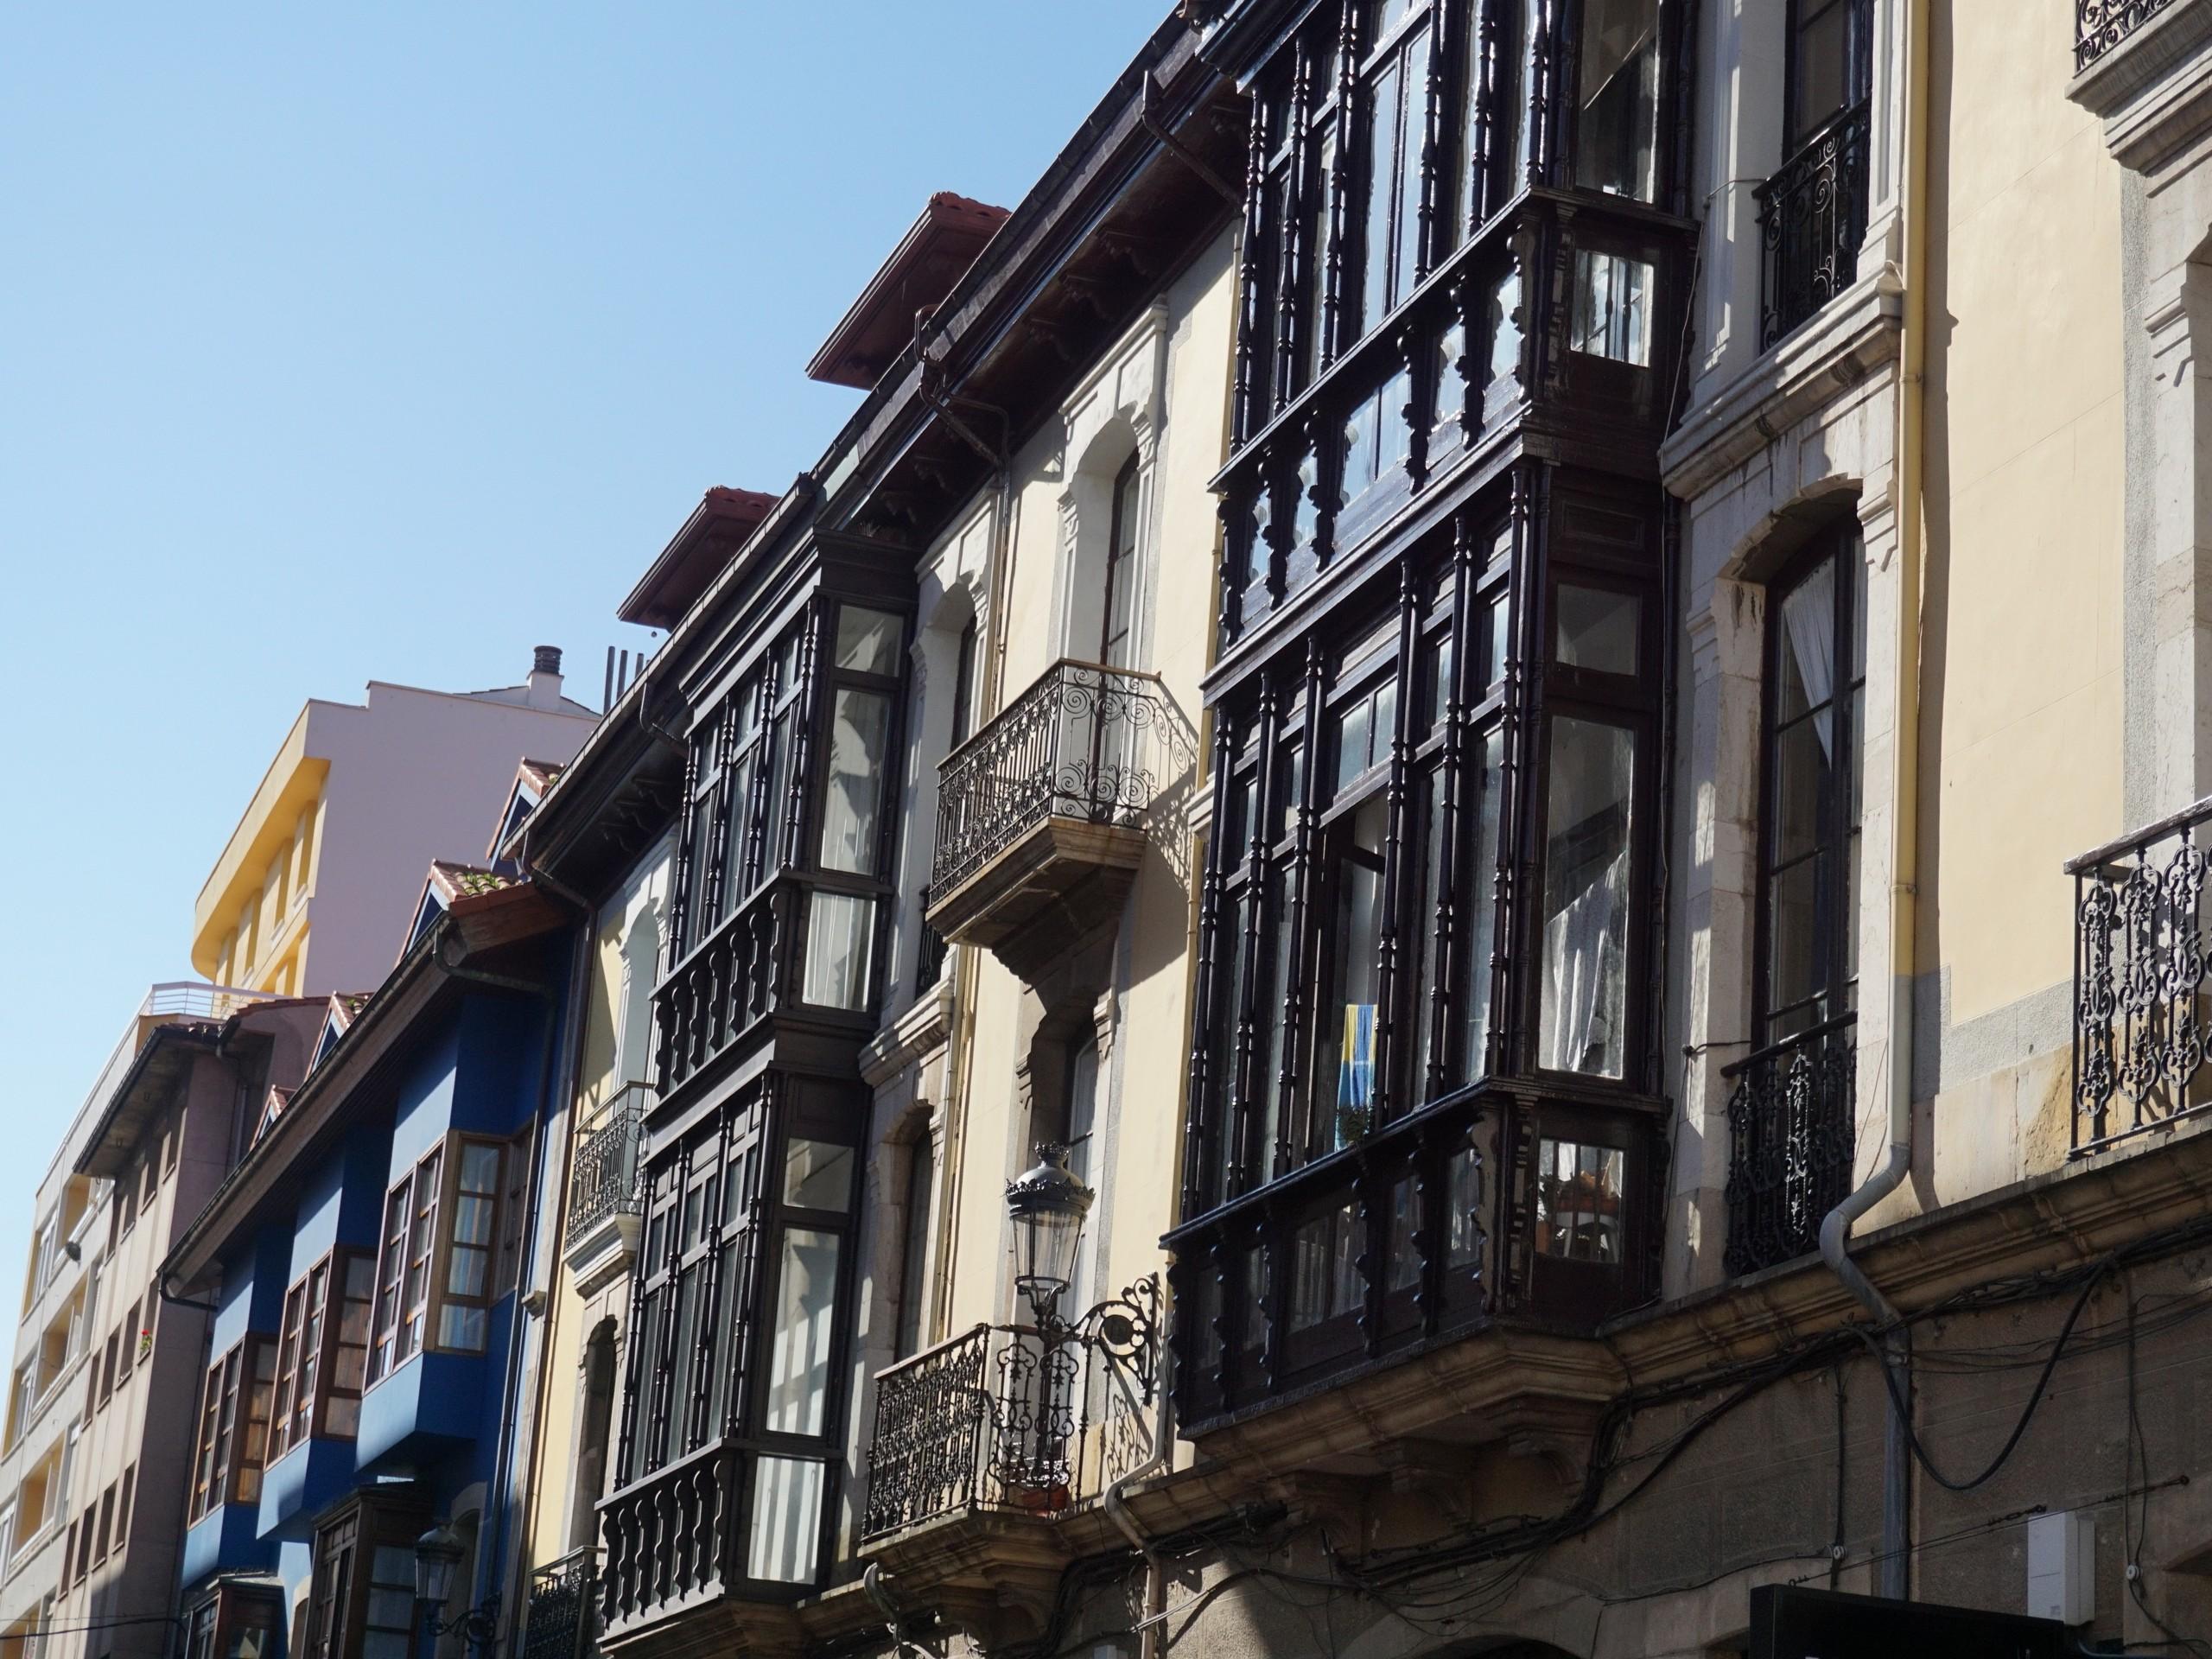 Buldings at Asturias